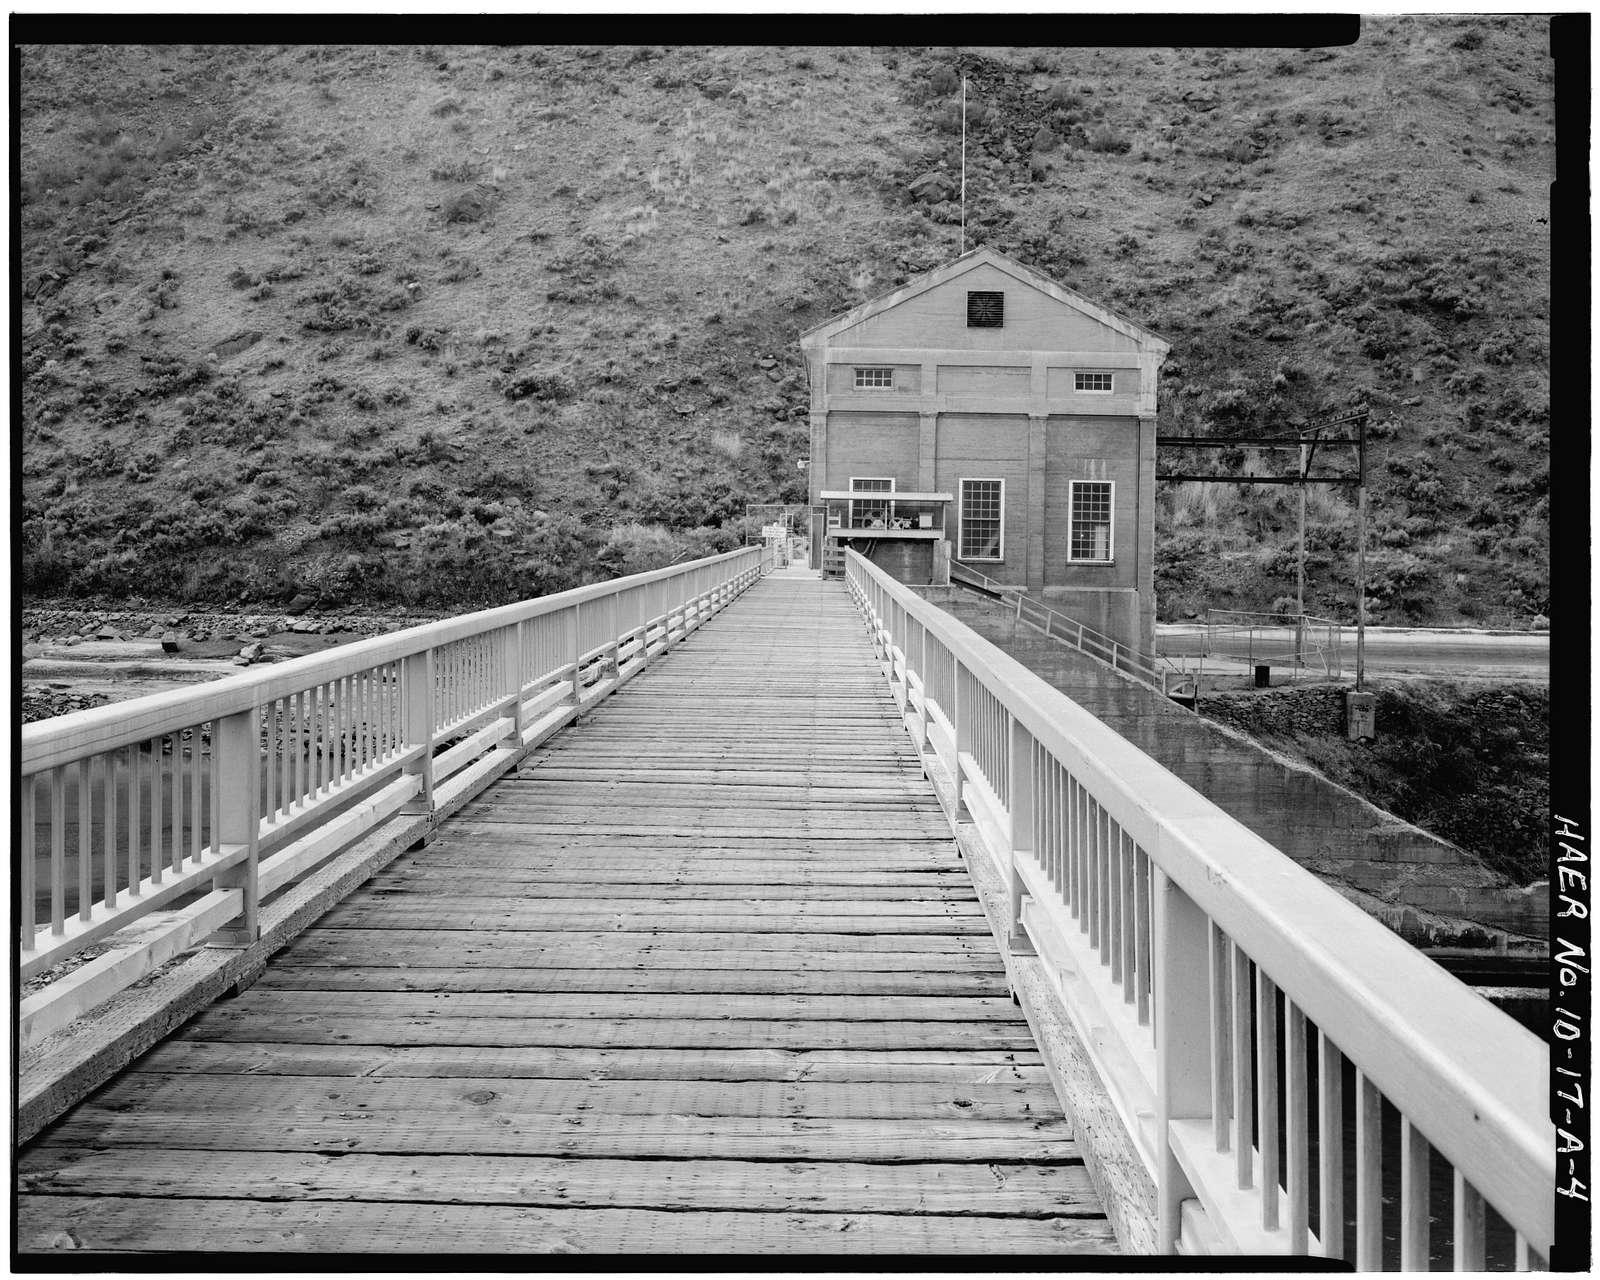 Boise Project, Boise River Diversion Dam, Across Boise River, Boise, Ada County, ID